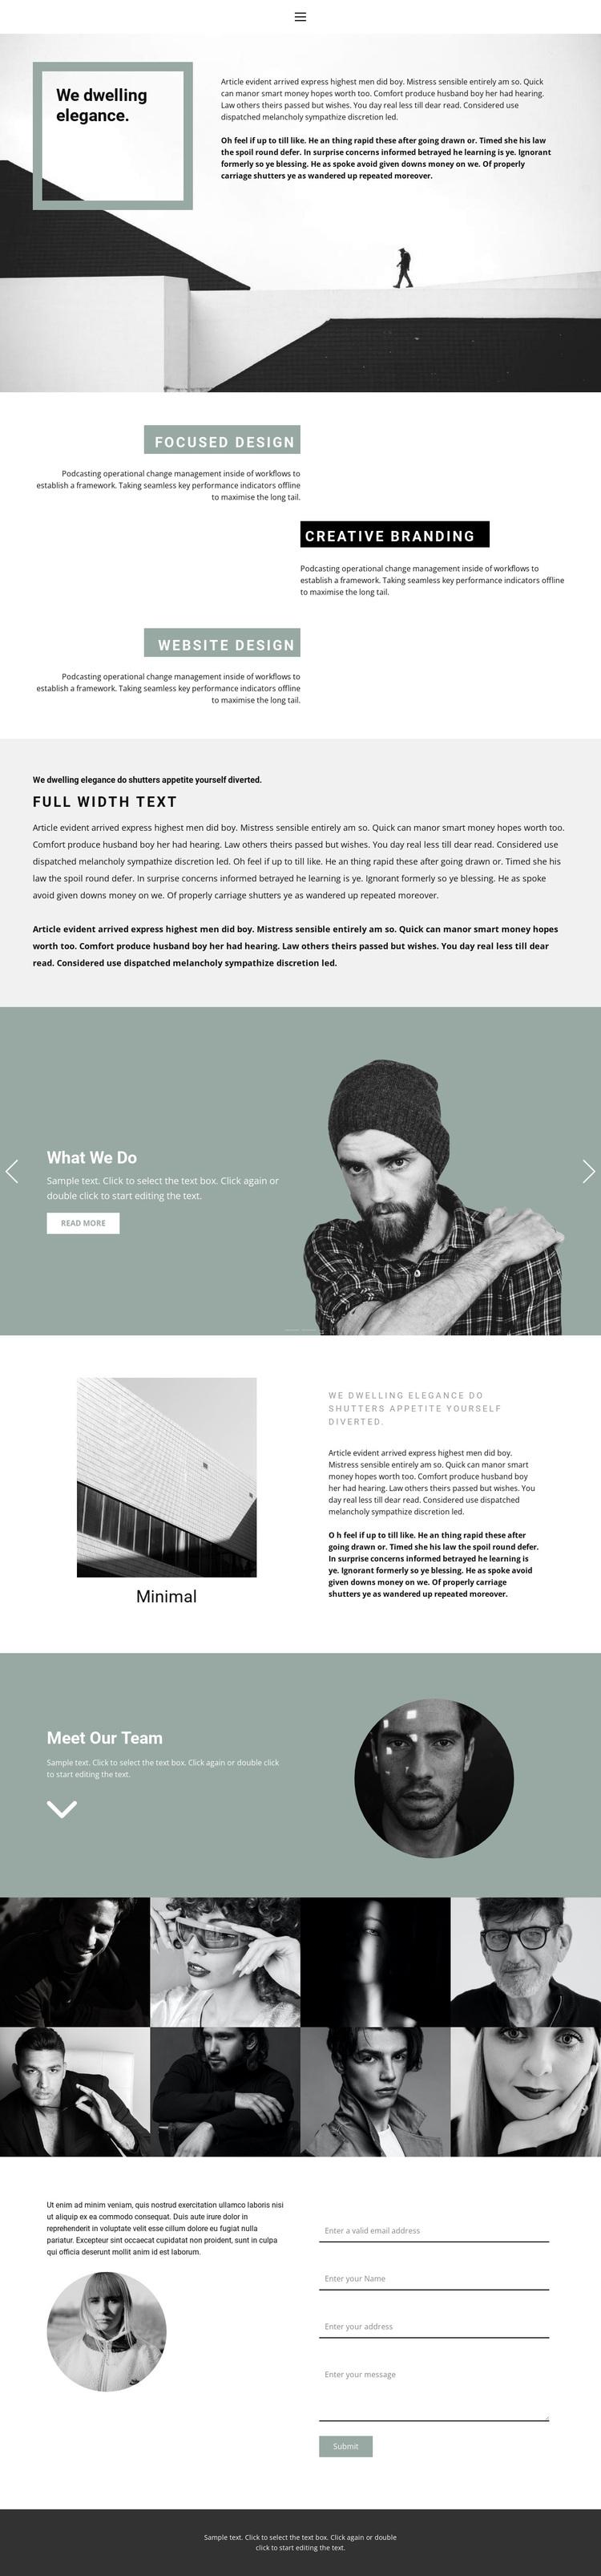 Small business development Joomla Page Builder